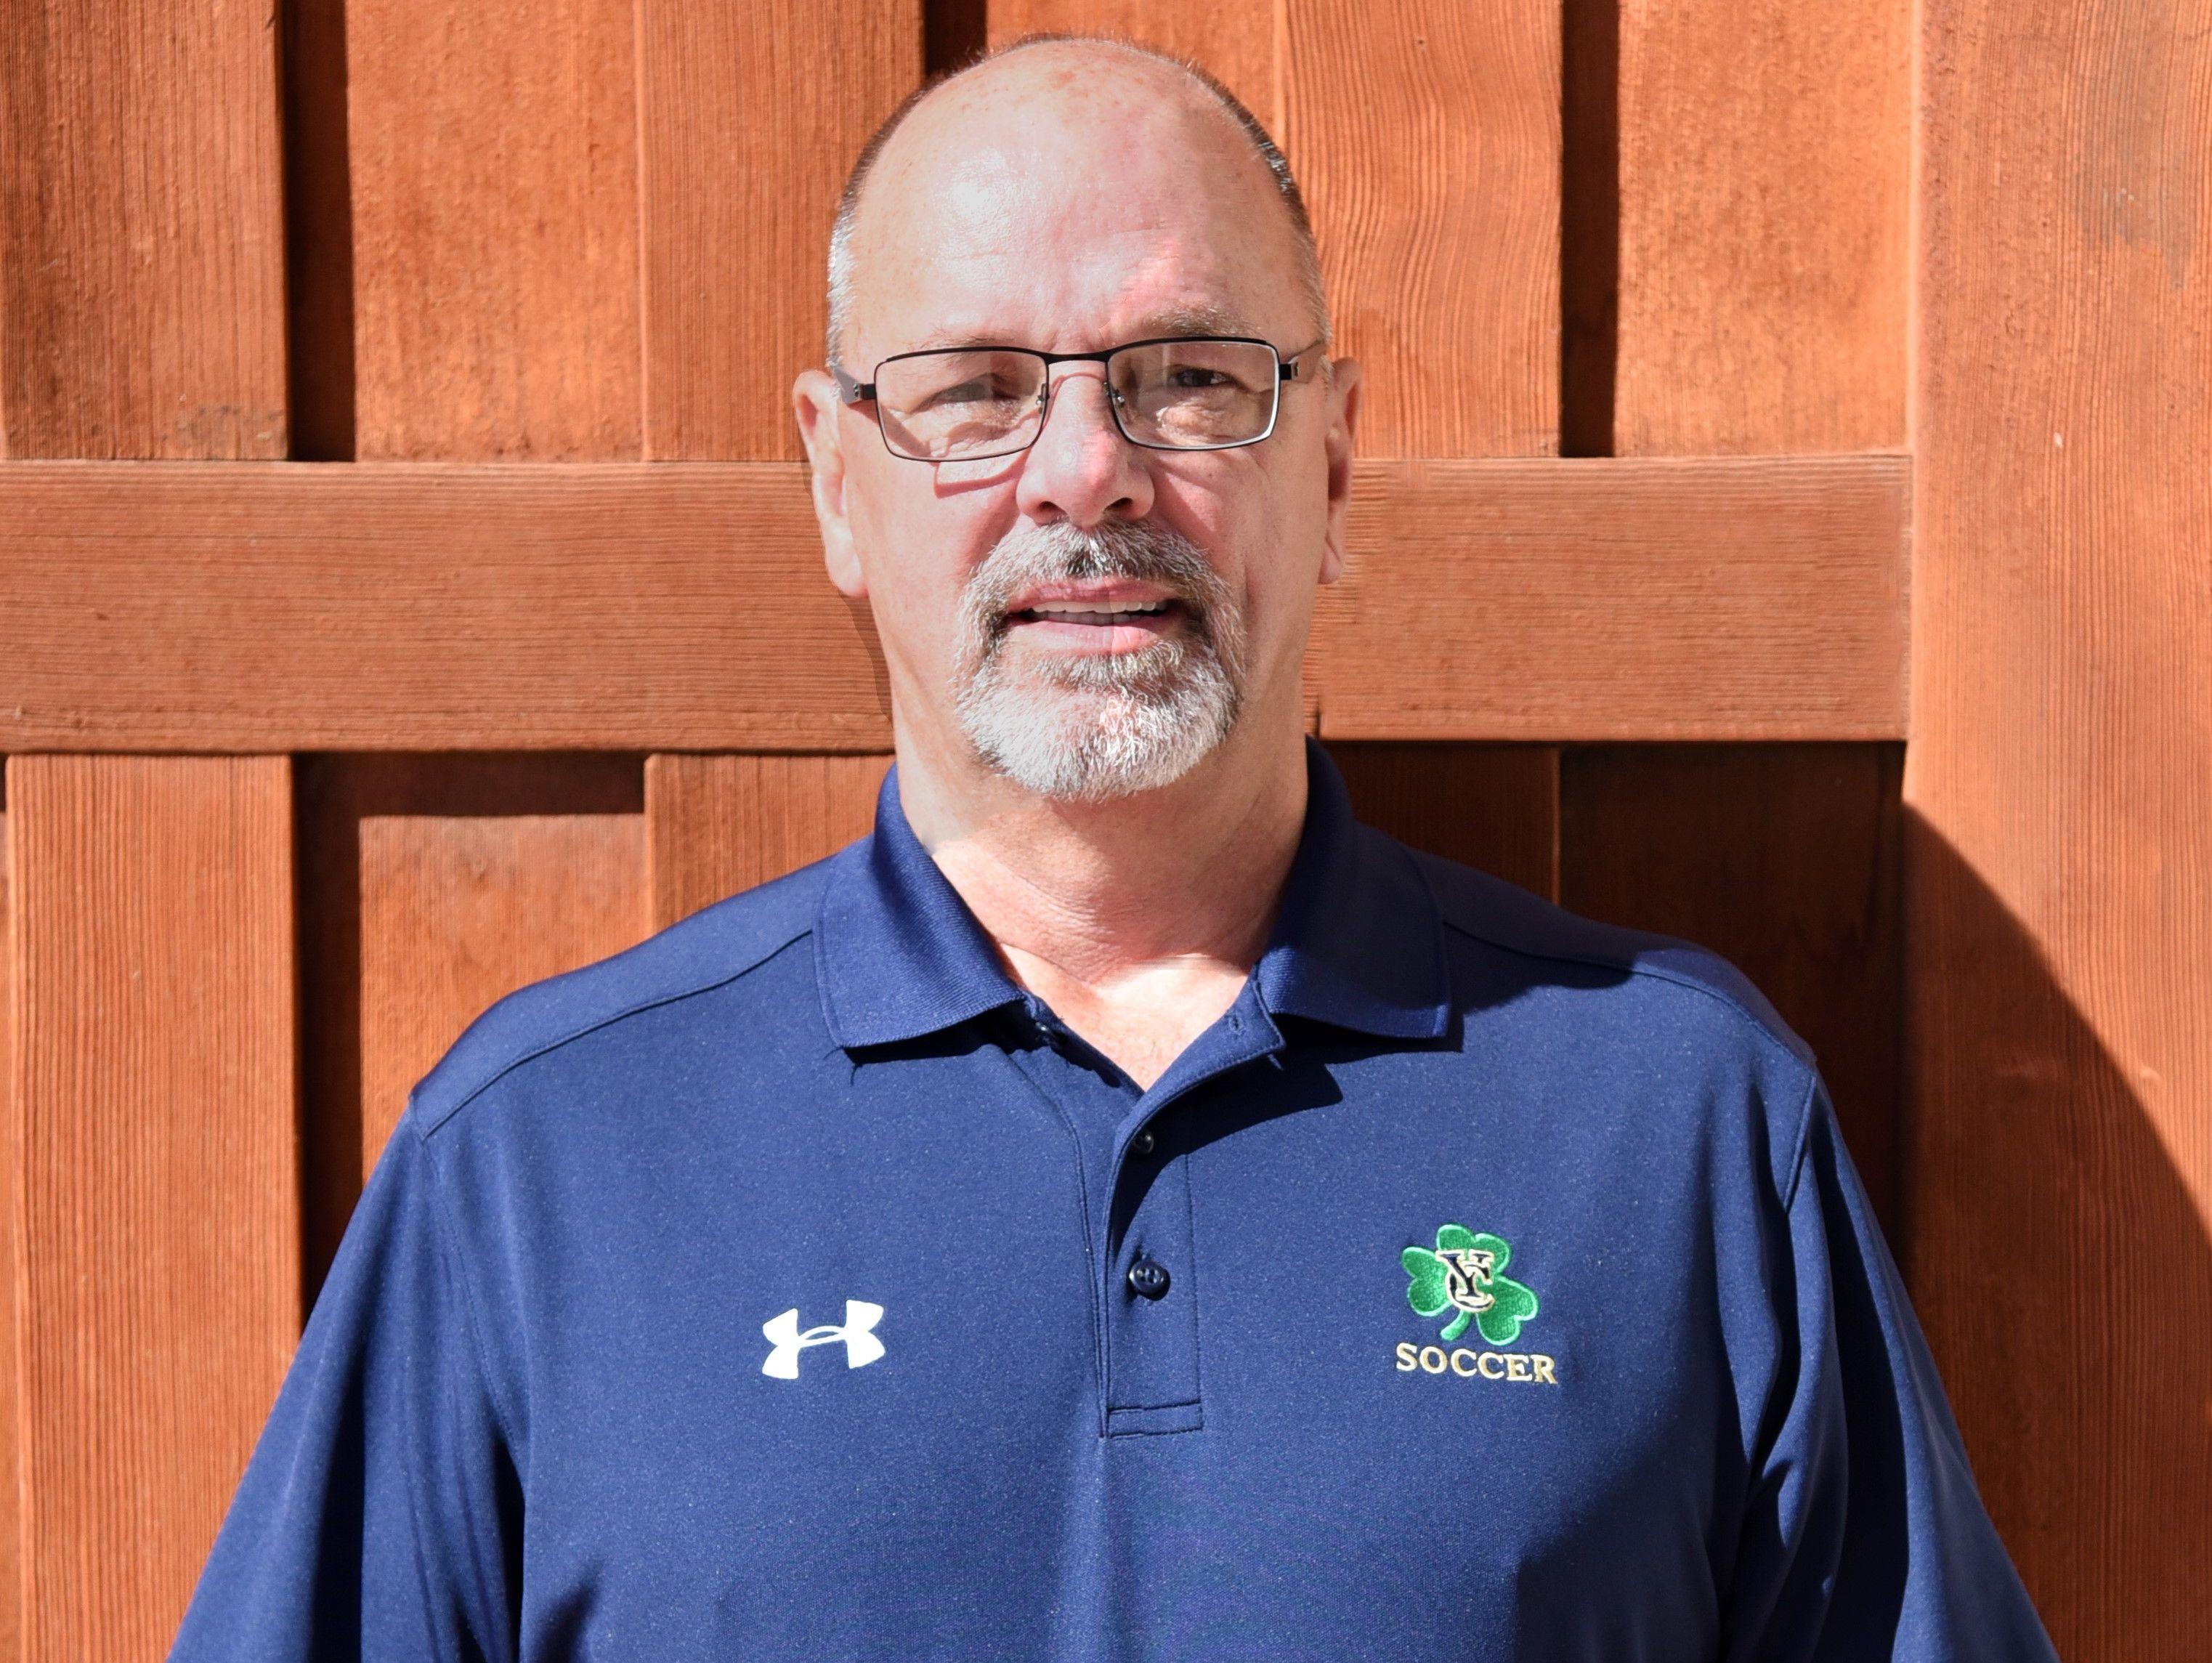 Yuma Catholic boys soccer coach Ralph Evans is the azcentral.com Sports Awards Small Schools Boys Soccer Coach of the Year.